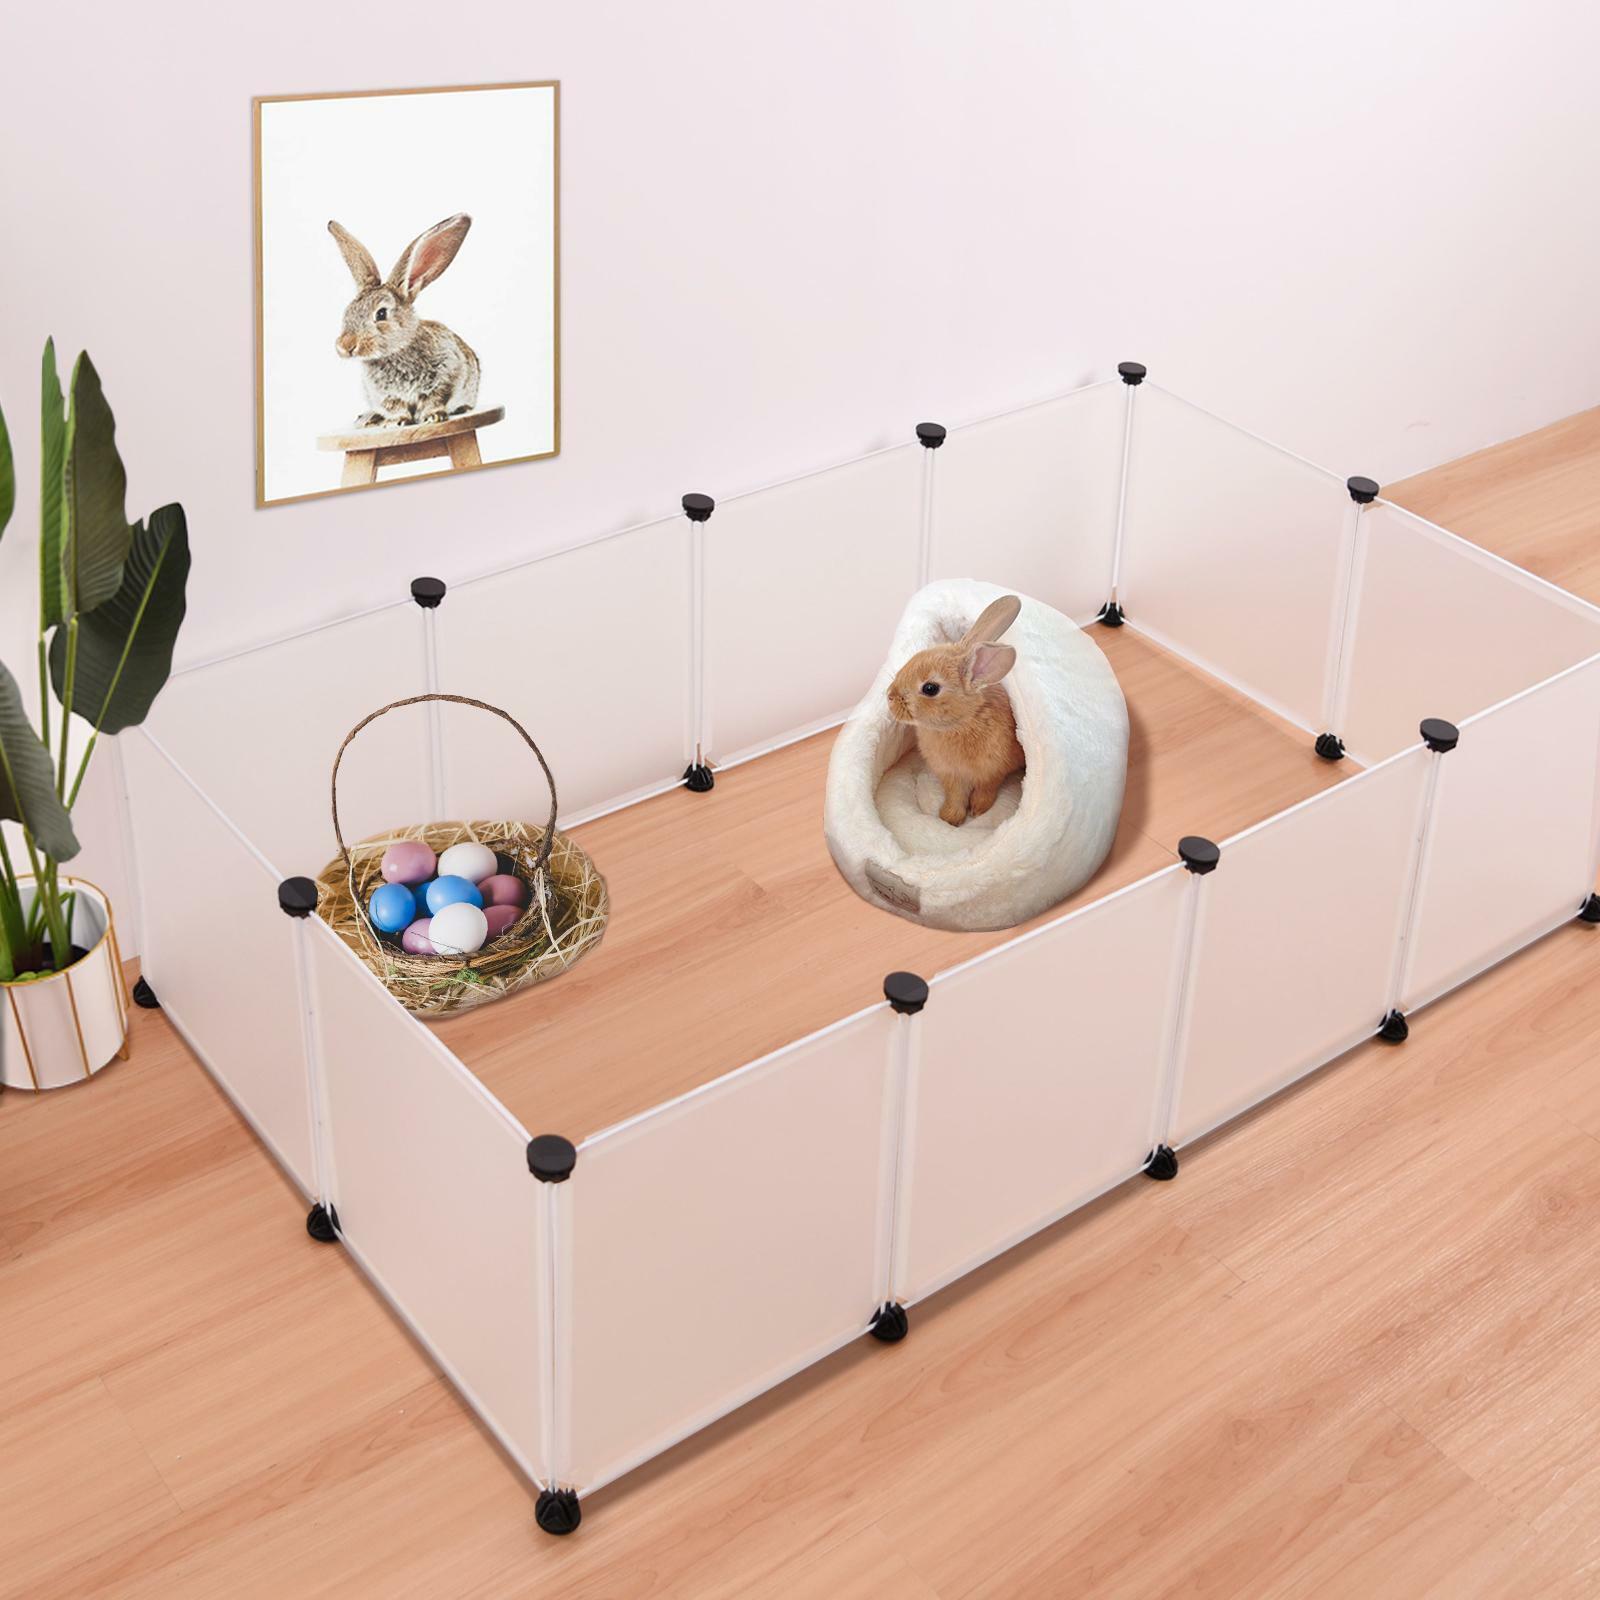 Portable PP Plastic Dog Pet Playpen Crate Animal Fence Exerc